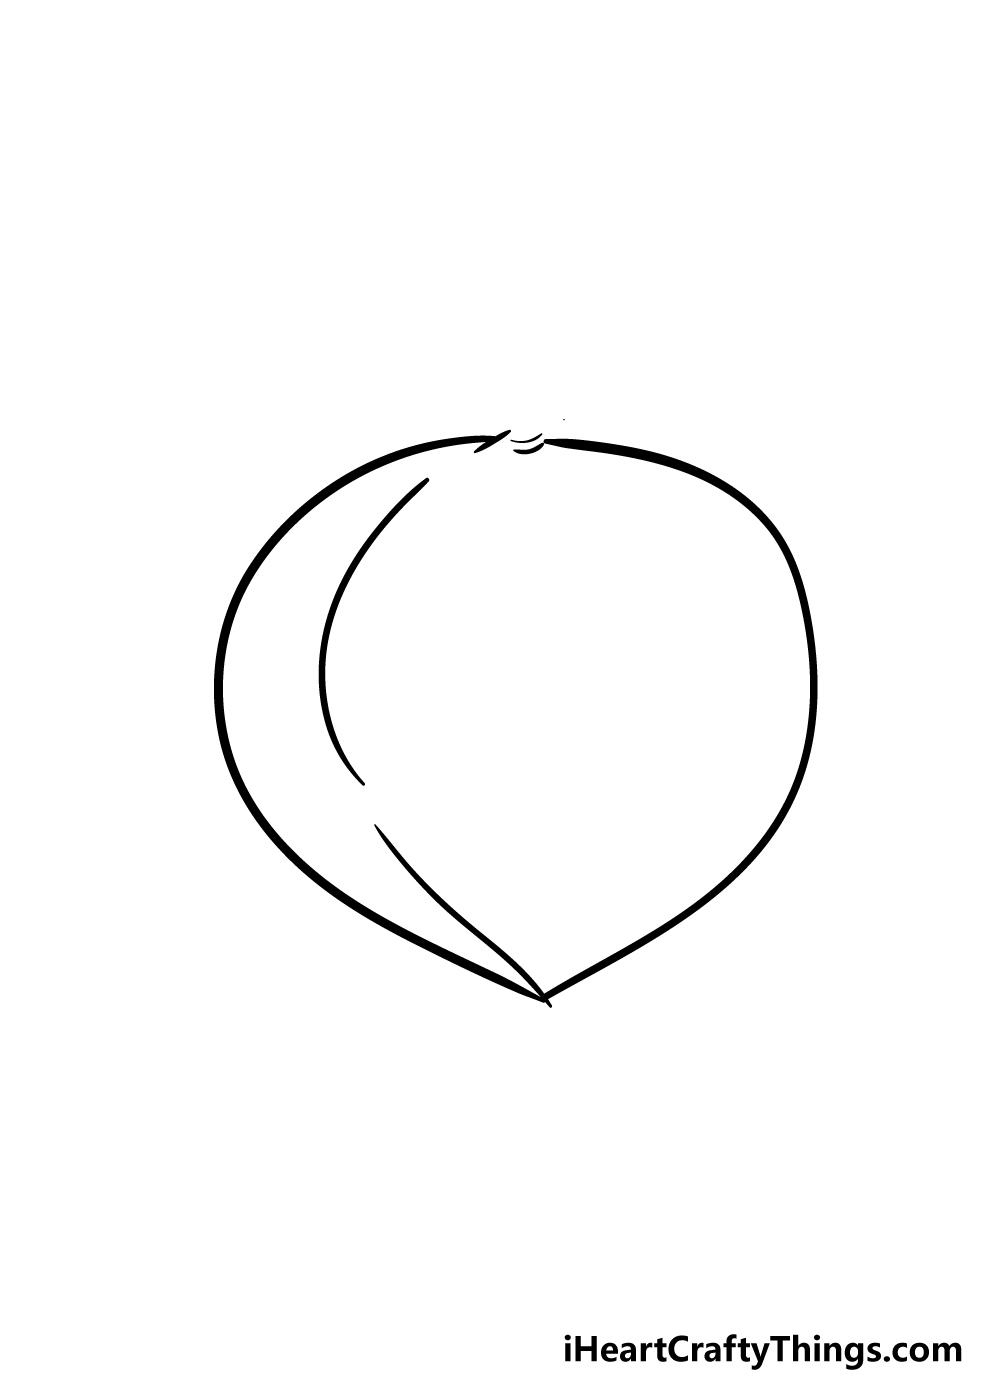 peach drawing step 2